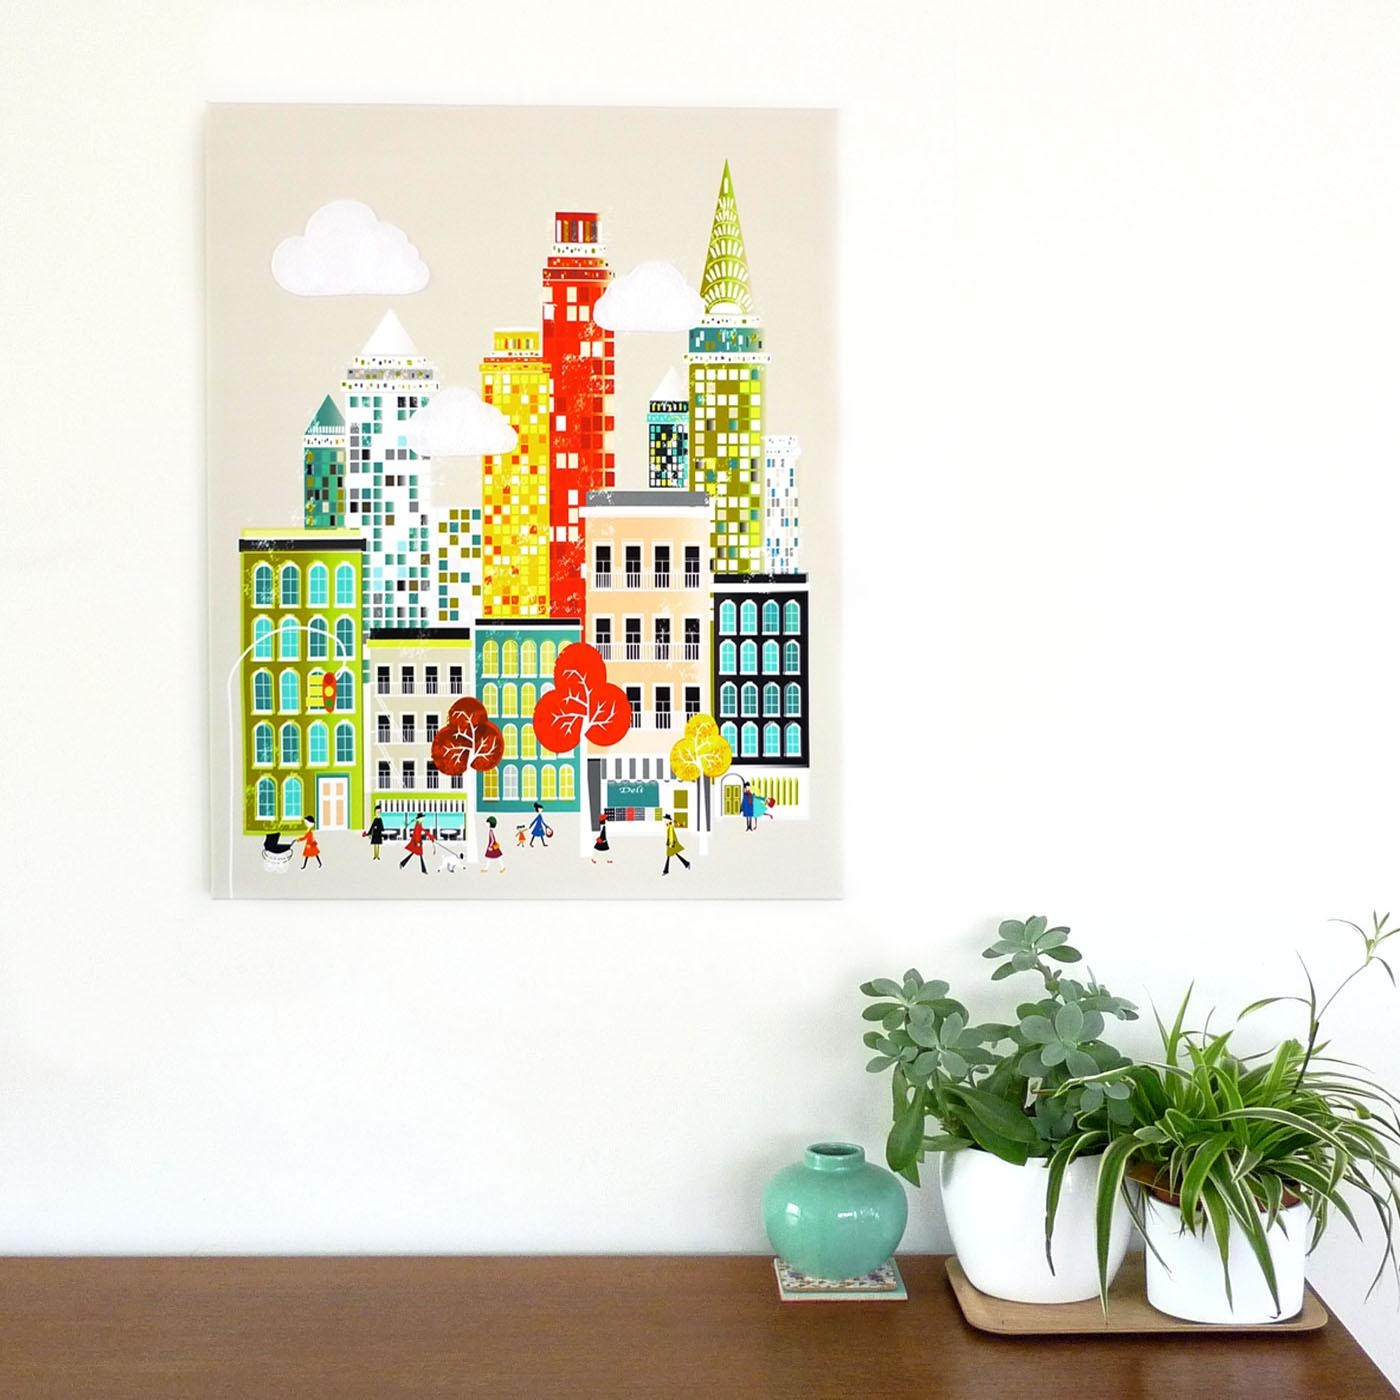 New York Wall Art, Manhattan Skyline, Framed Canvas Wall Art Inside Cityscape Canvas Wall Art (Image 13 of 20)